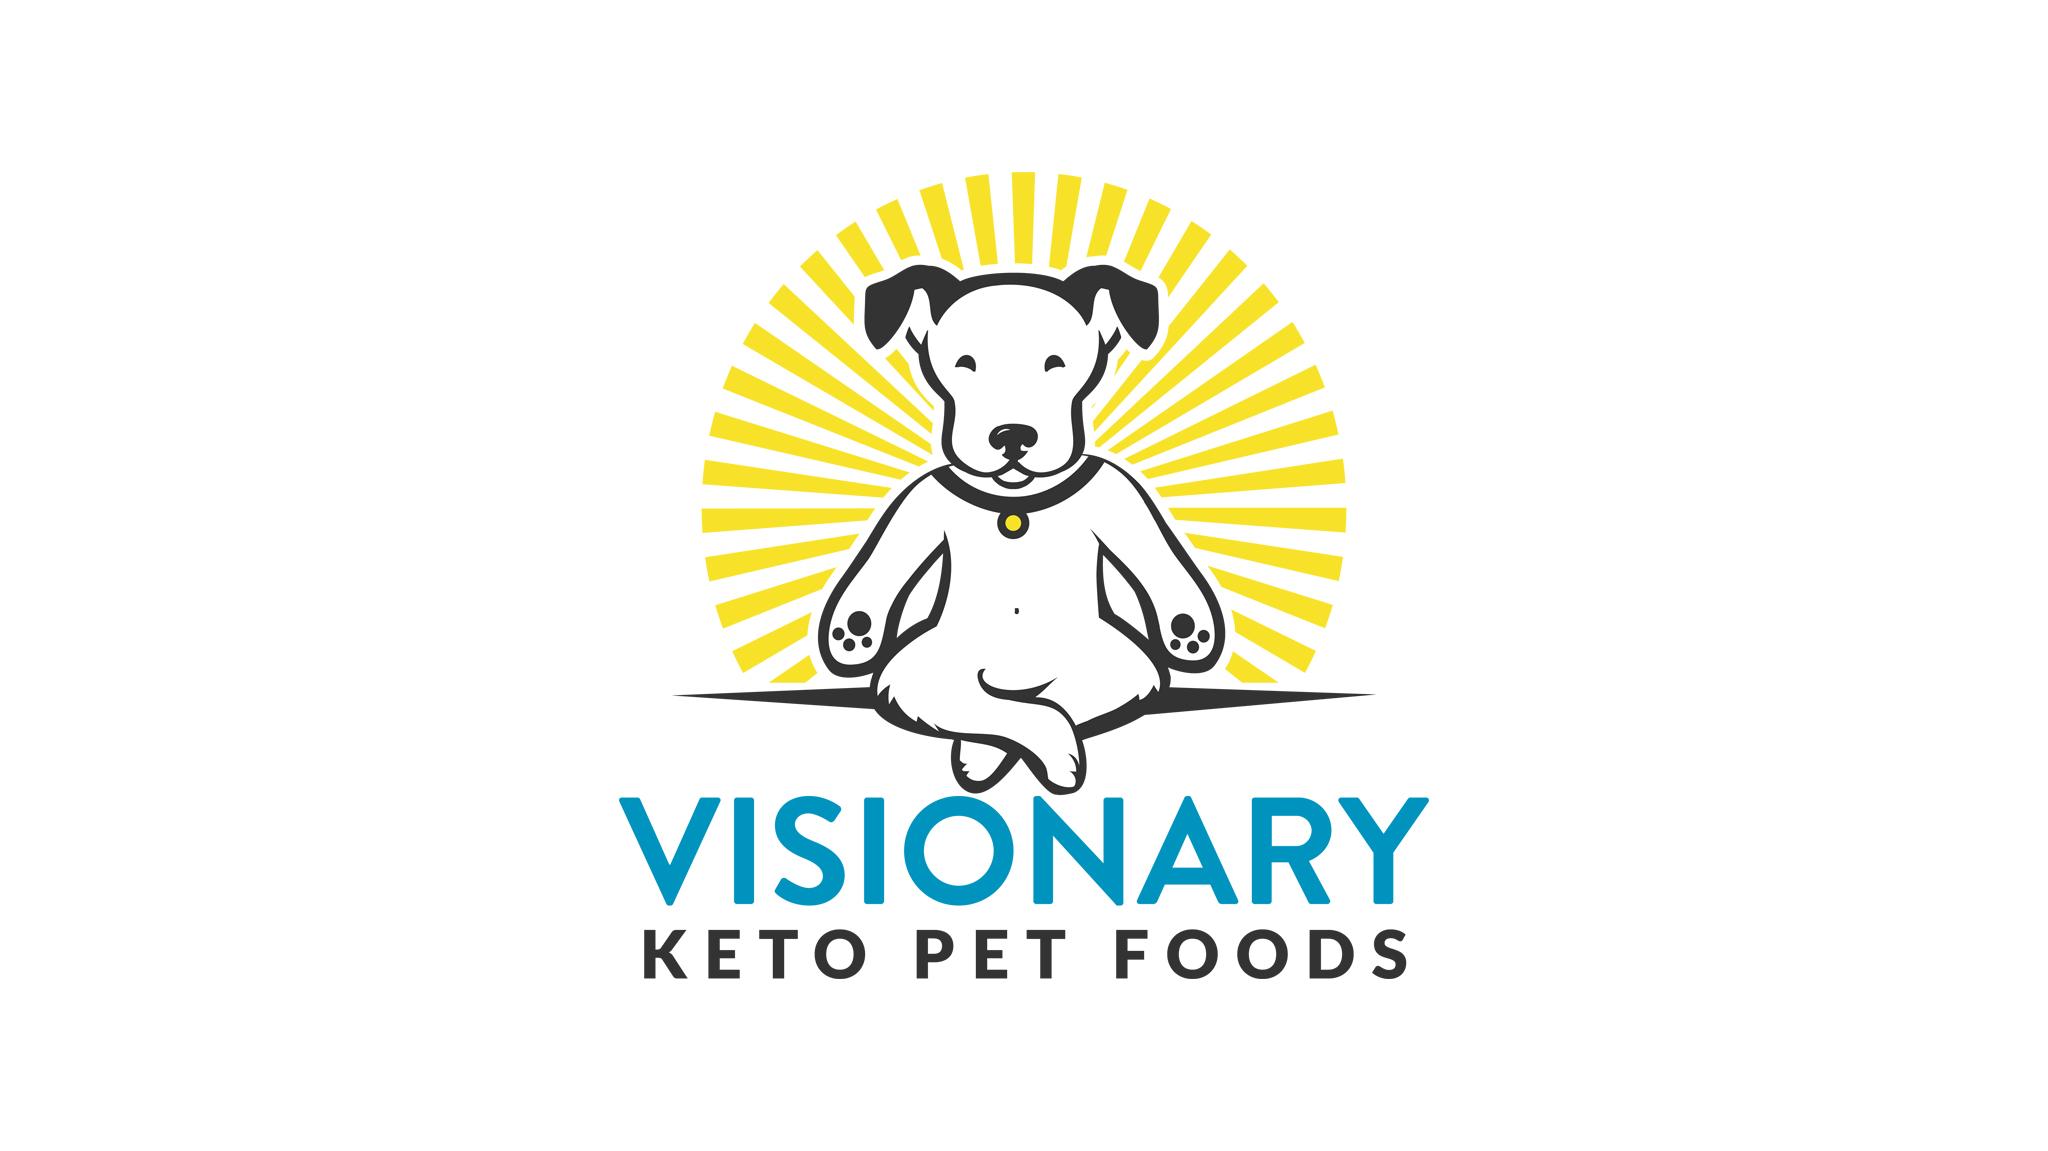 visionaryketopetfoods